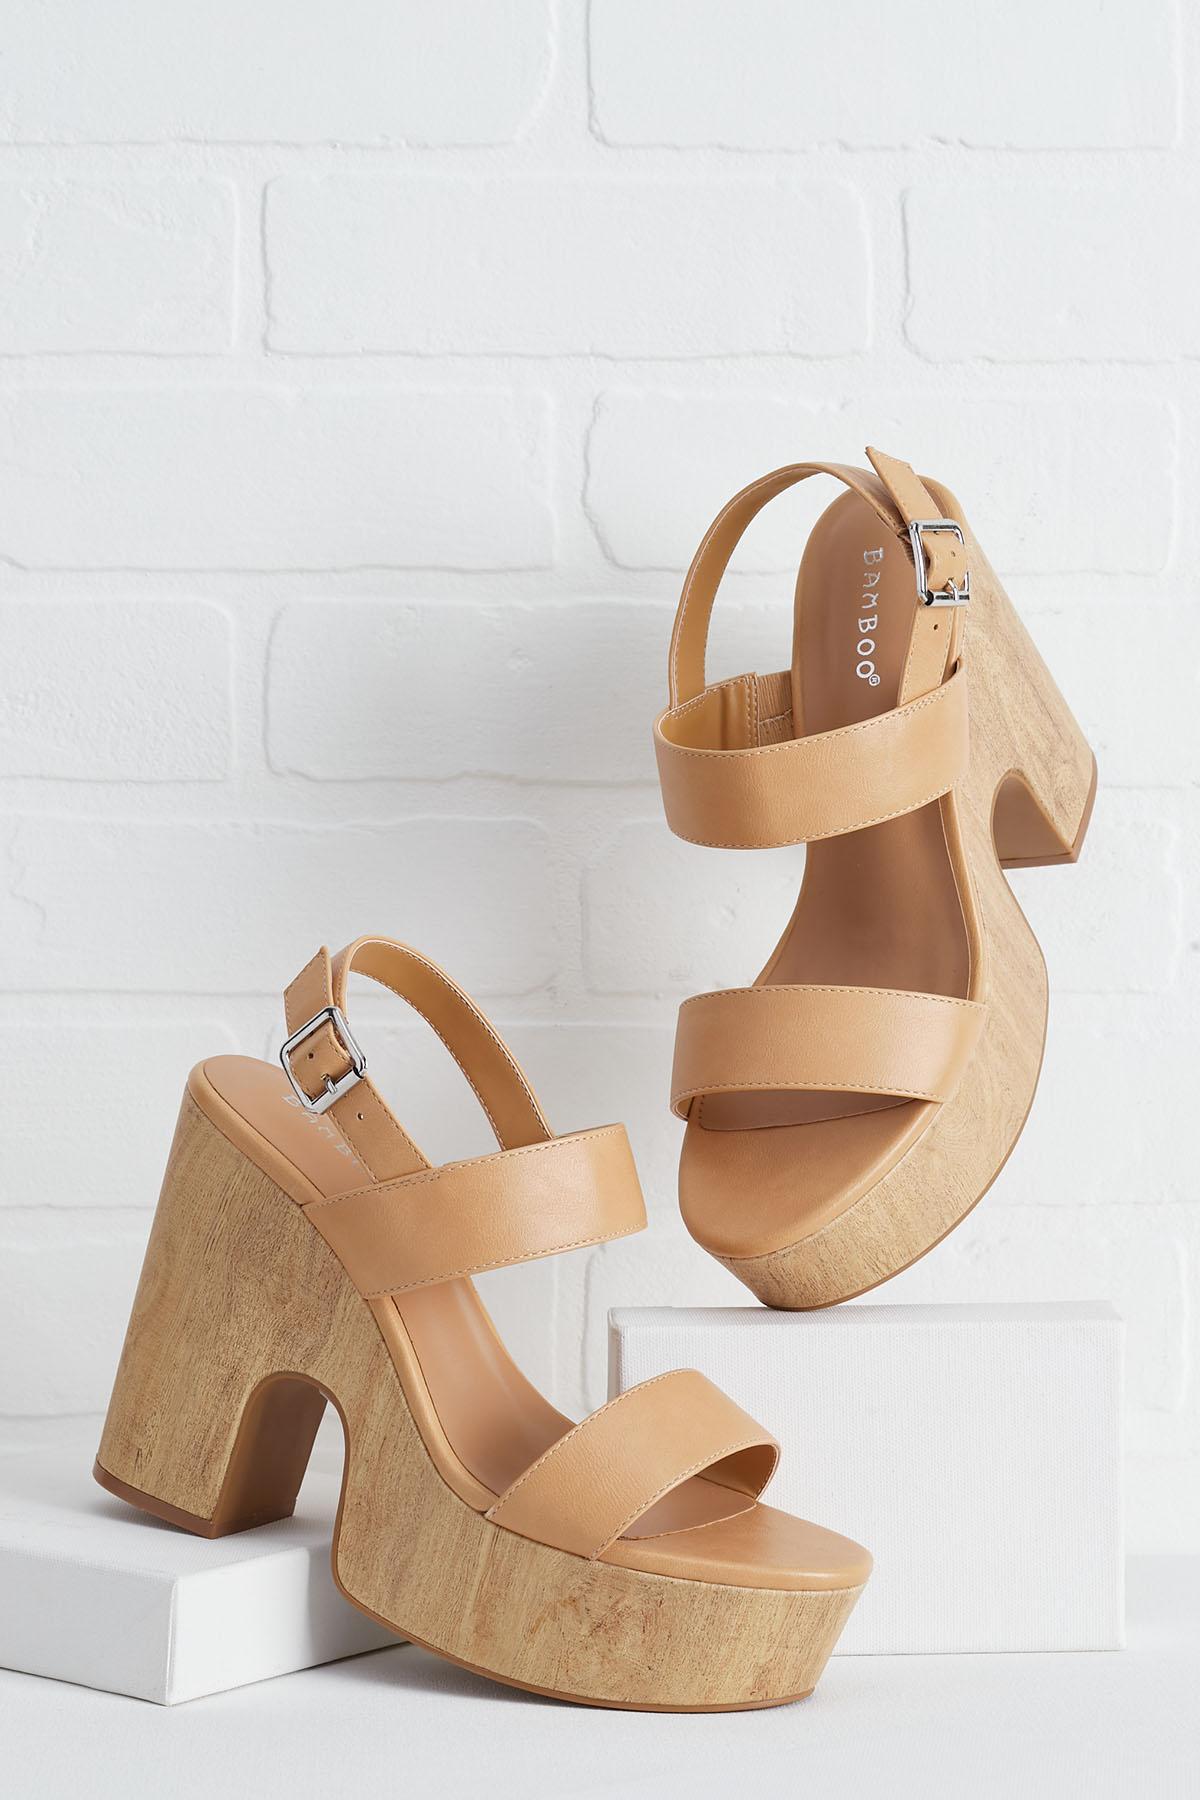 Wish You Wood Heels